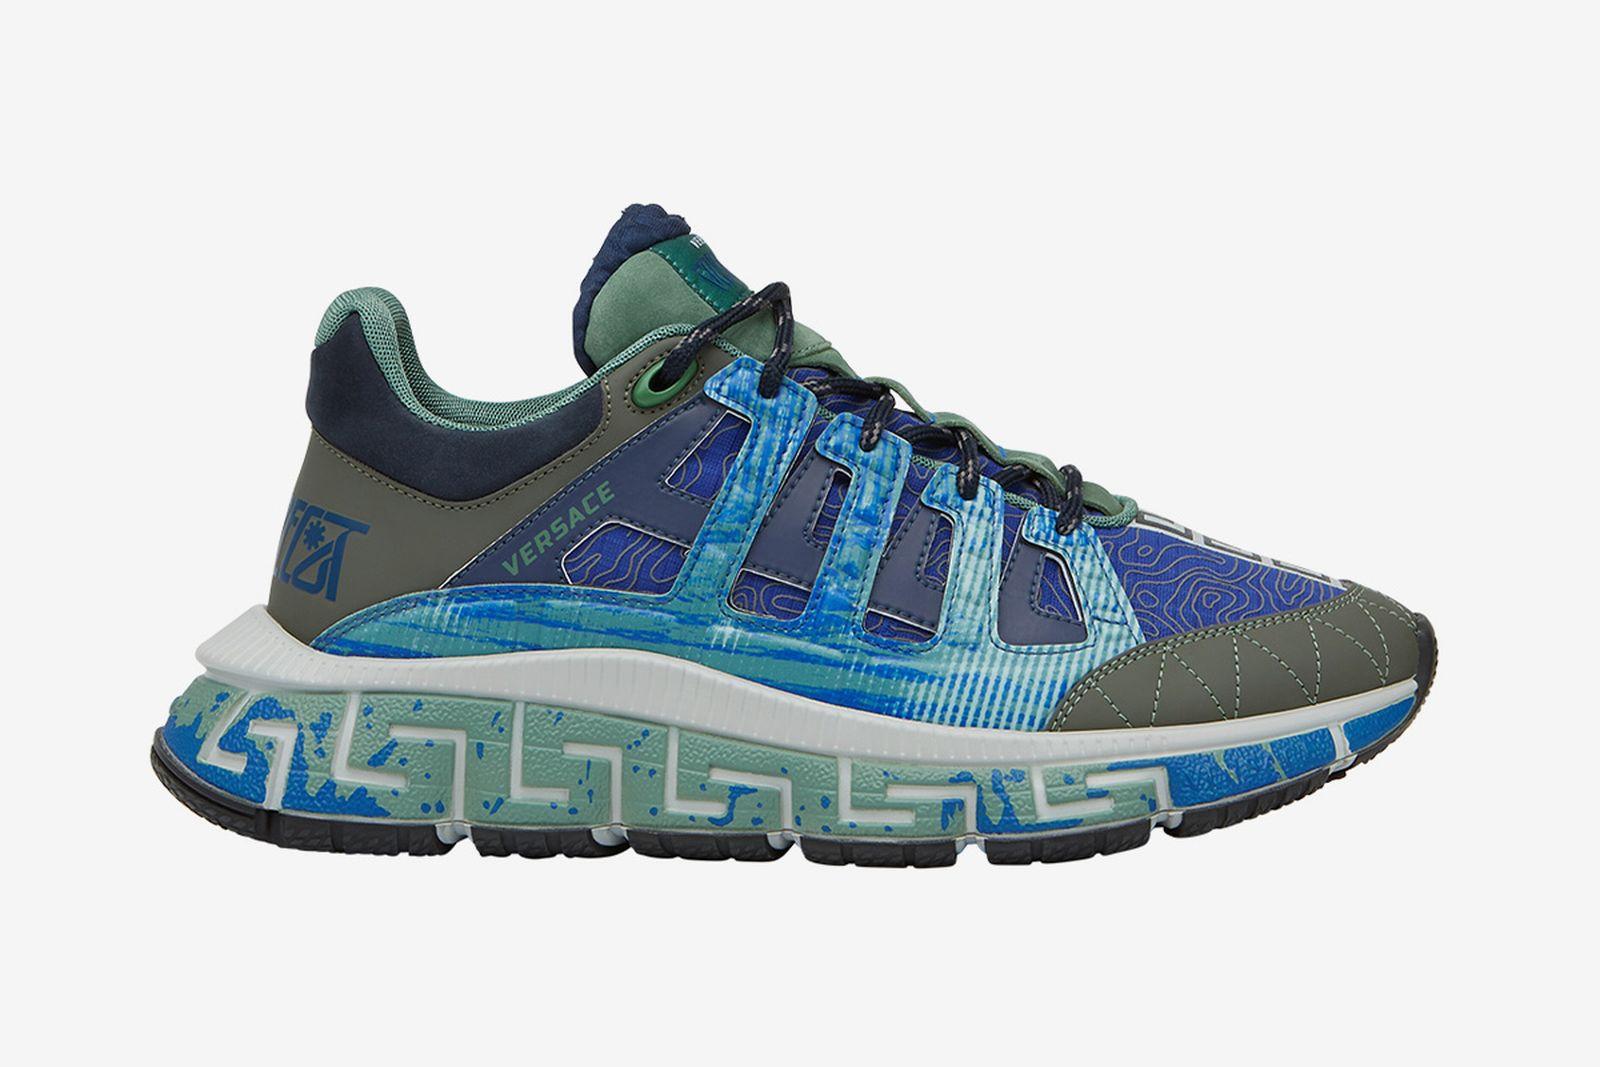 versace-trigreca-sneaker-release-date-price-02